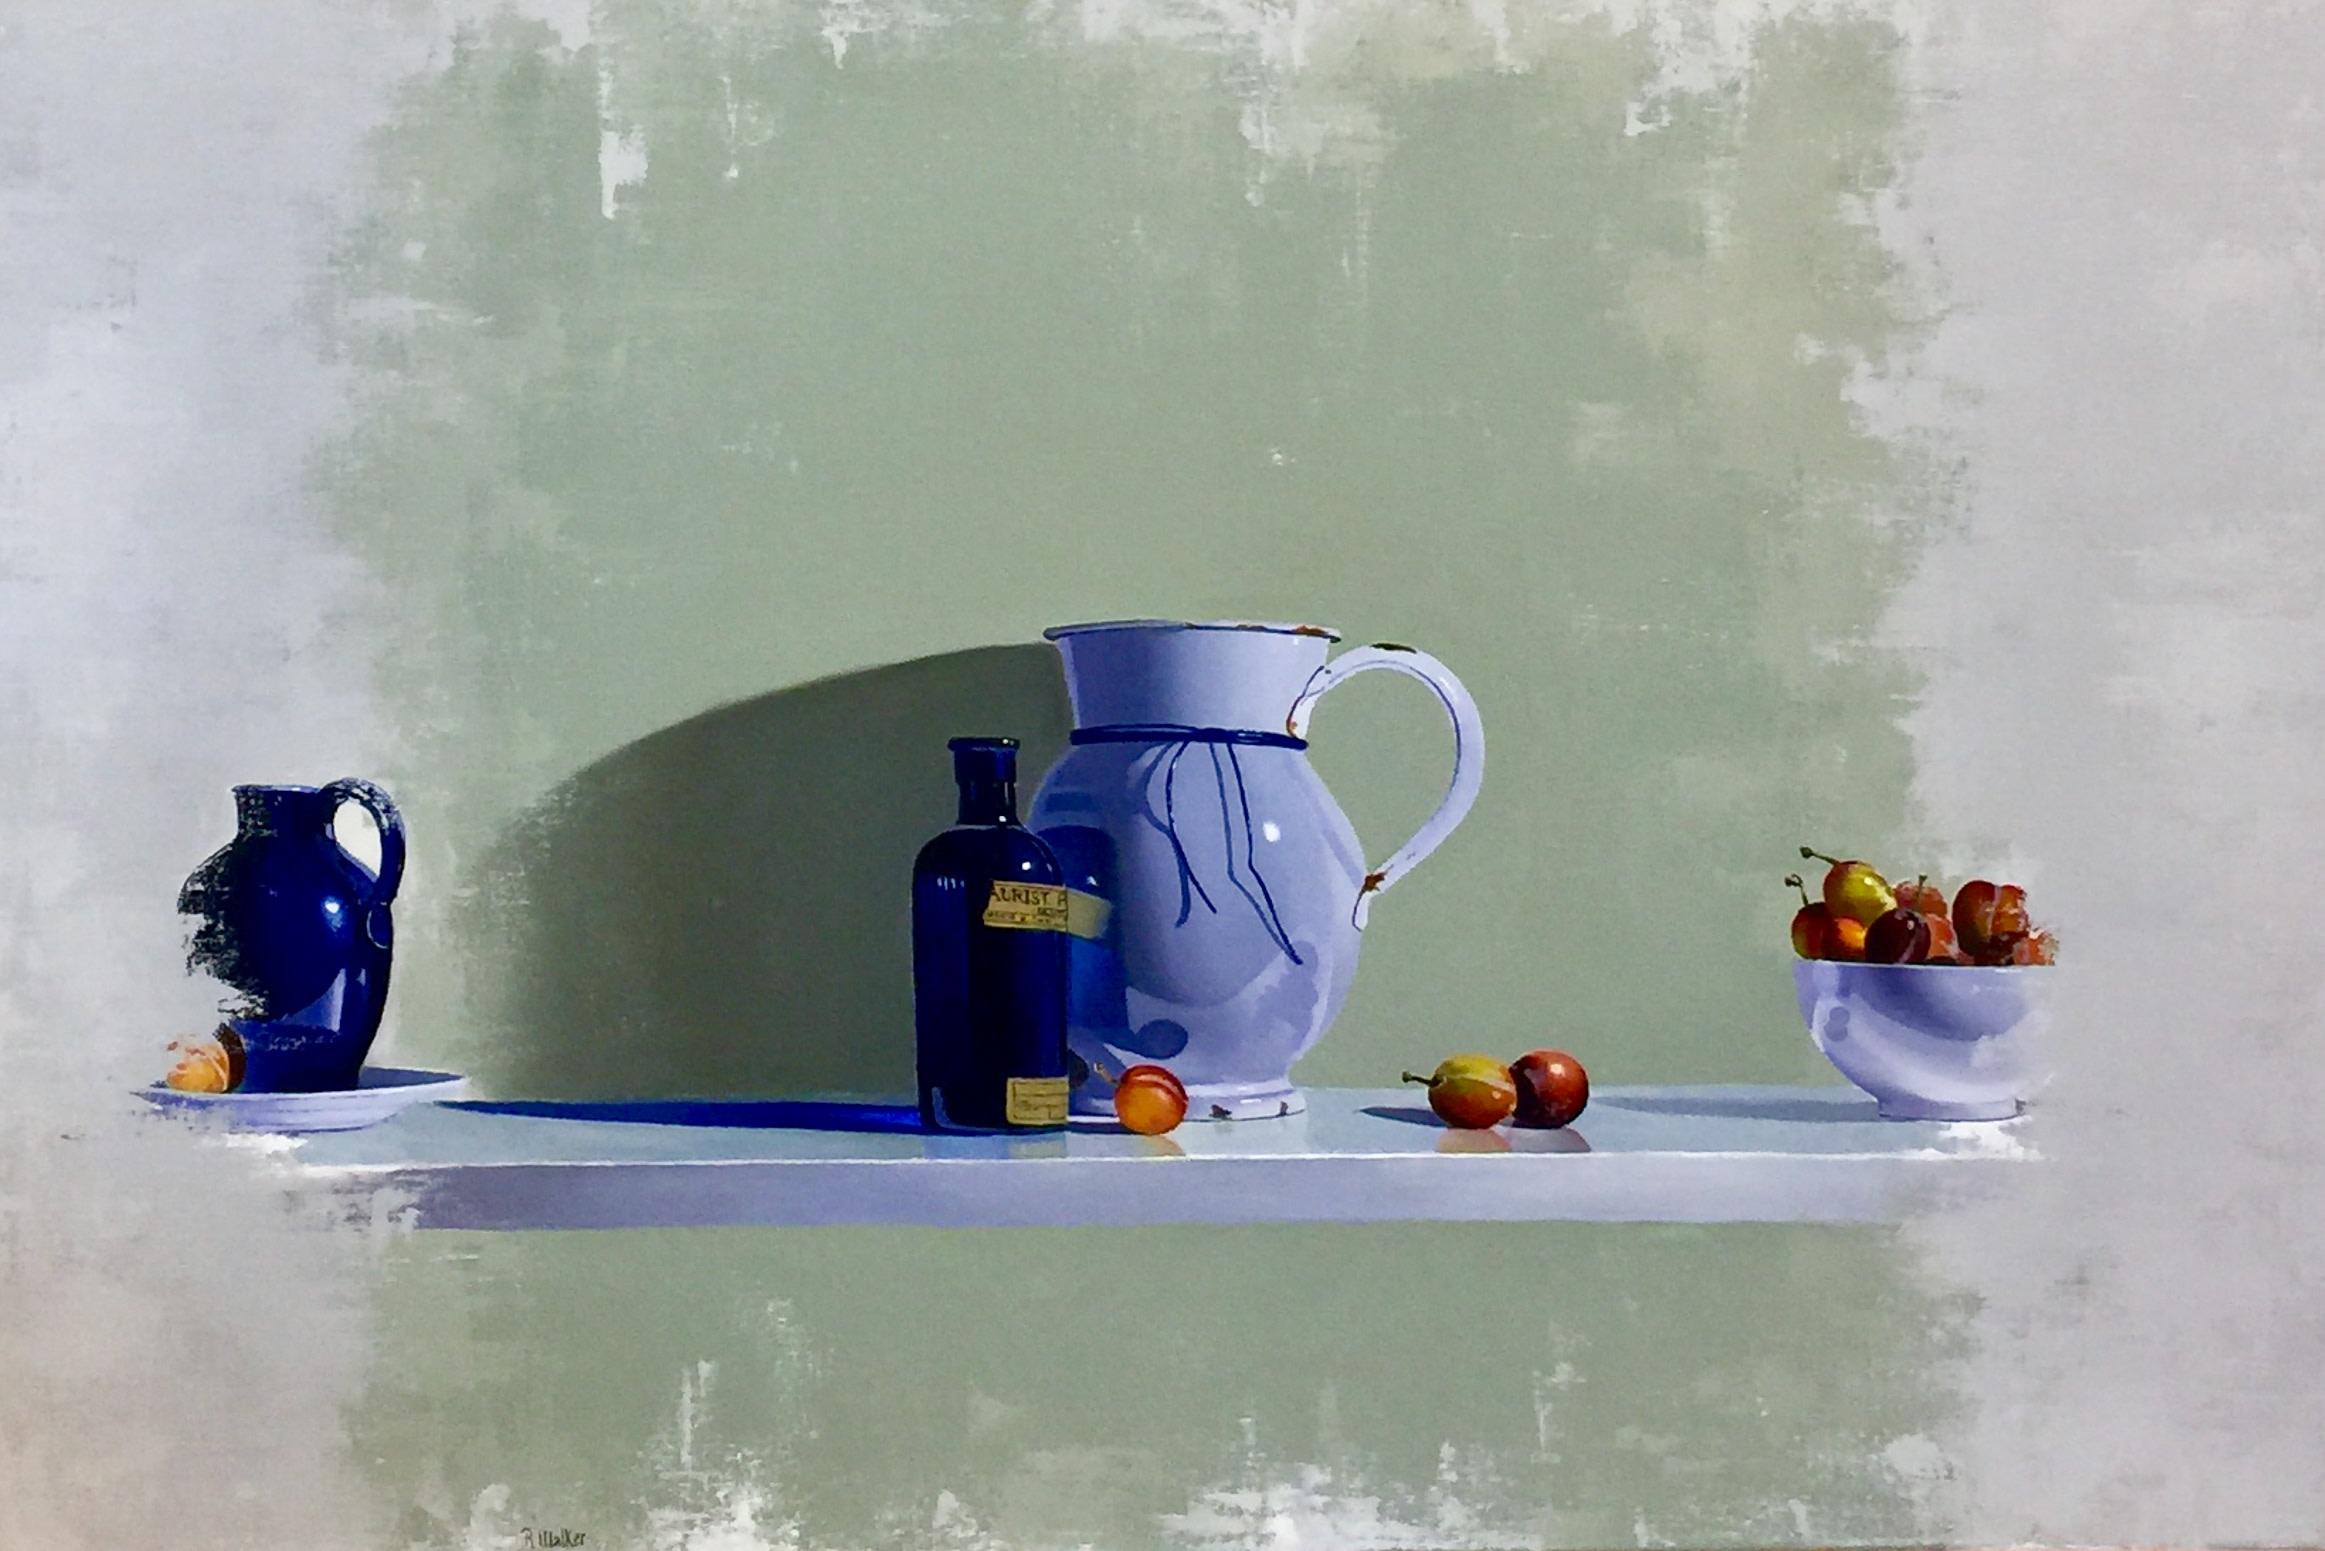 <span class=&#34;link fancybox-details-link&#34;><a href=&#34;/artists/67-robert-walker/works/2292-robert-walker-medicine-bottle-with-plums-in-hong-kong/&#34;>View Detail Page</a></span><div class=&#34;artist&#34;><strong>Robert Walker</strong></div> <div class=&#34;title&#34;><em>Medicine Bottle with Plums</em>, In Hong Kong</div> <div class=&#34;medium&#34;>Oil on Canvas </div> <div class=&#34;dimensions&#34;>61 x 91 cm </div><div class=&#34;price&#34;>HK$22,000.00</div><div class=&#34;copyright_line&#34;>Copyright The Artist</div>